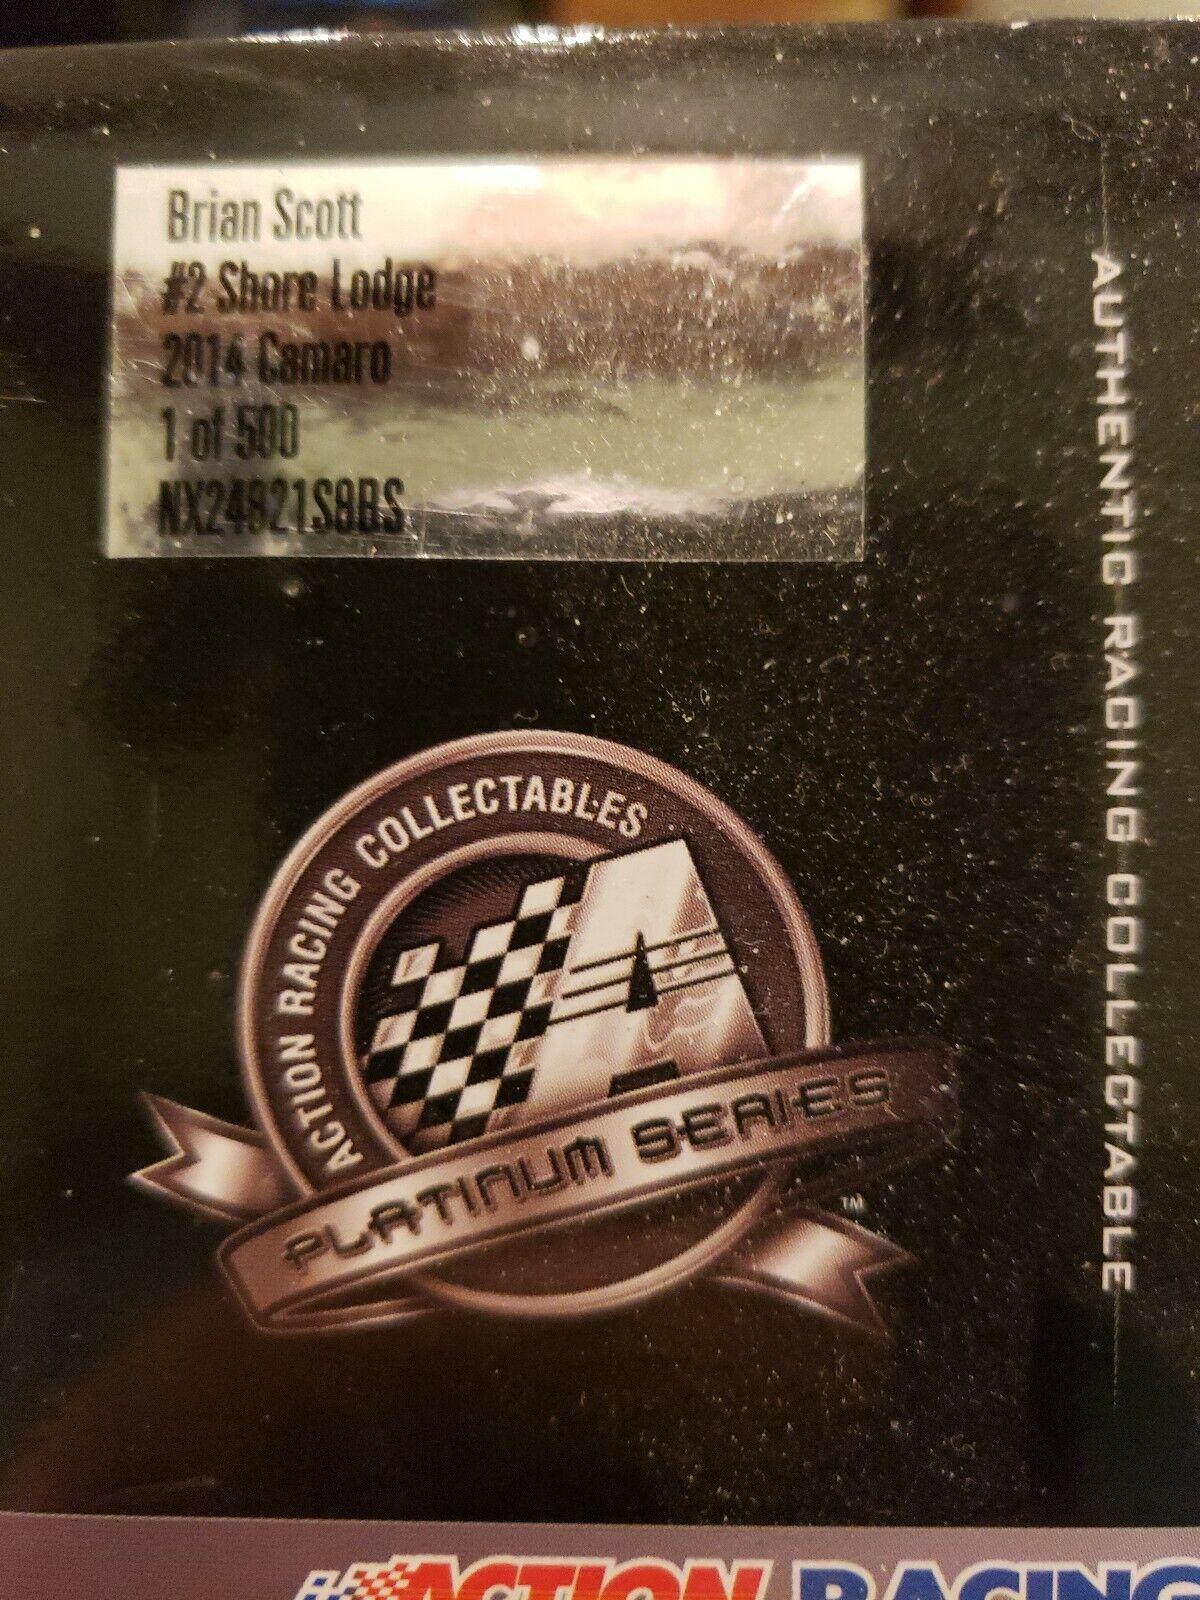 1 24 ACTION Brian Brian Brian Scott Shore Lodge 2014 Chevy Camaro 1 of 500 d1d452